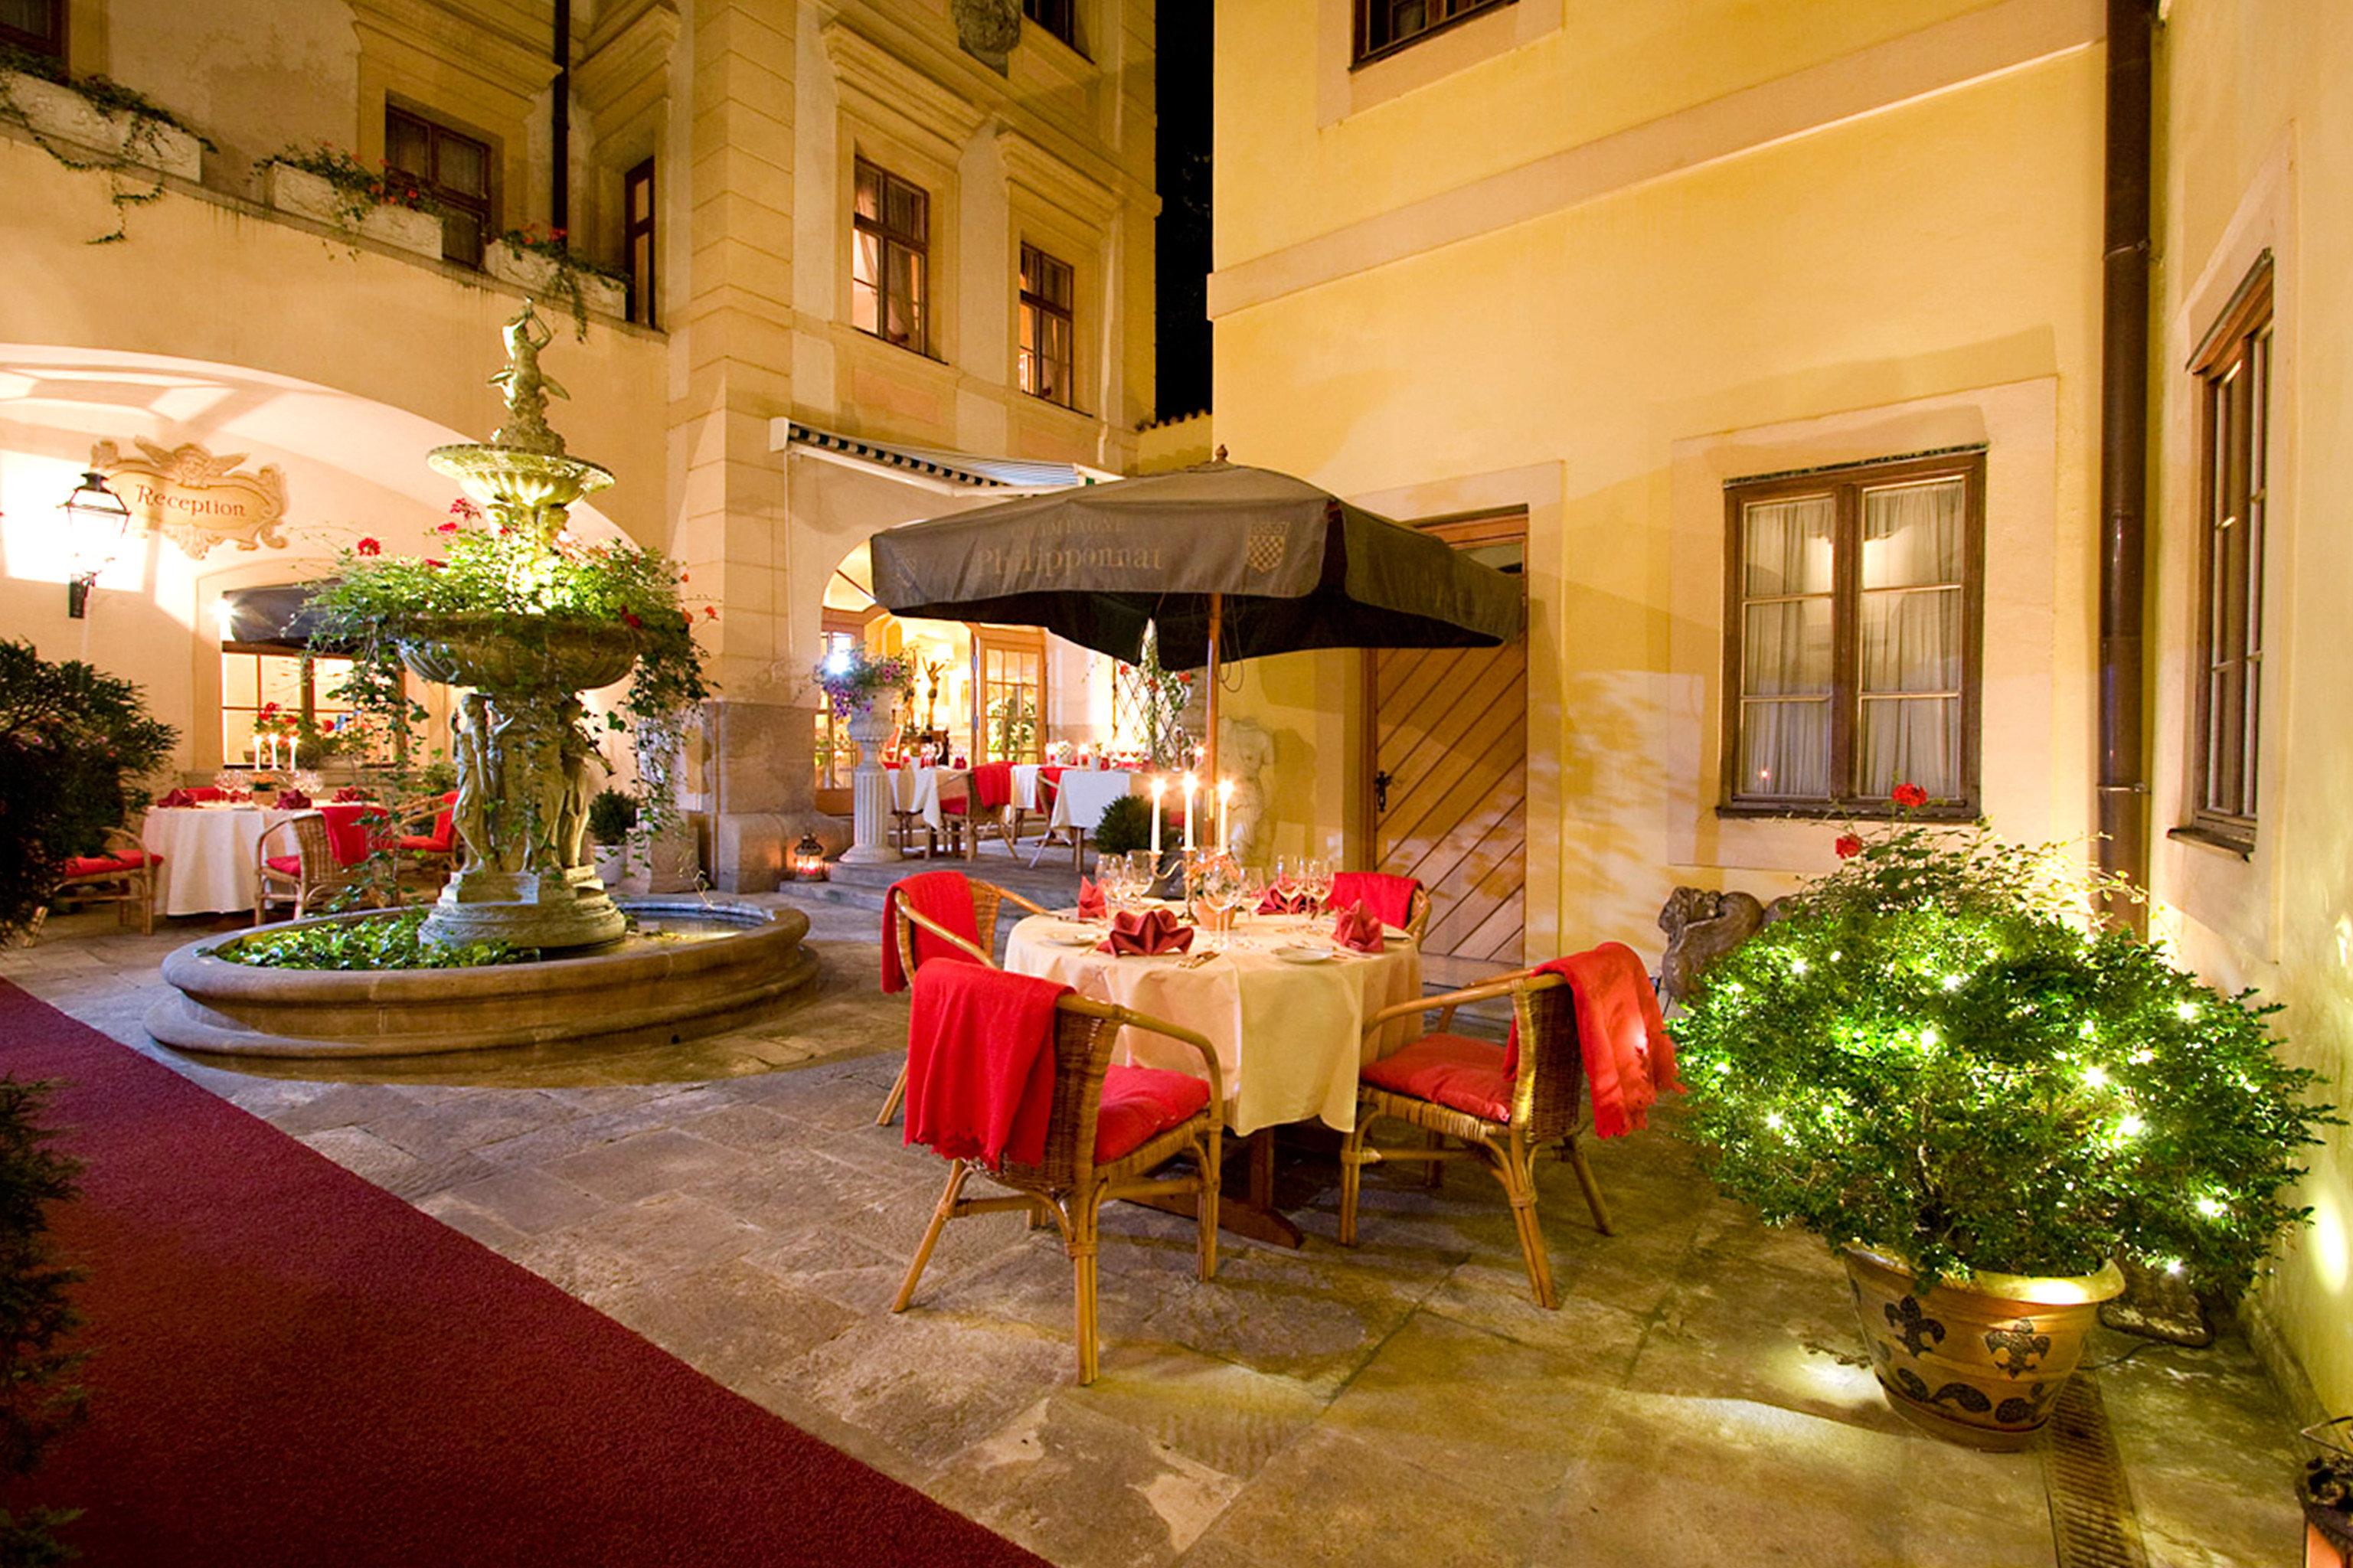 Elegant Historic Lounge Luxury restaurant Resort function hall palace Lobby hacienda